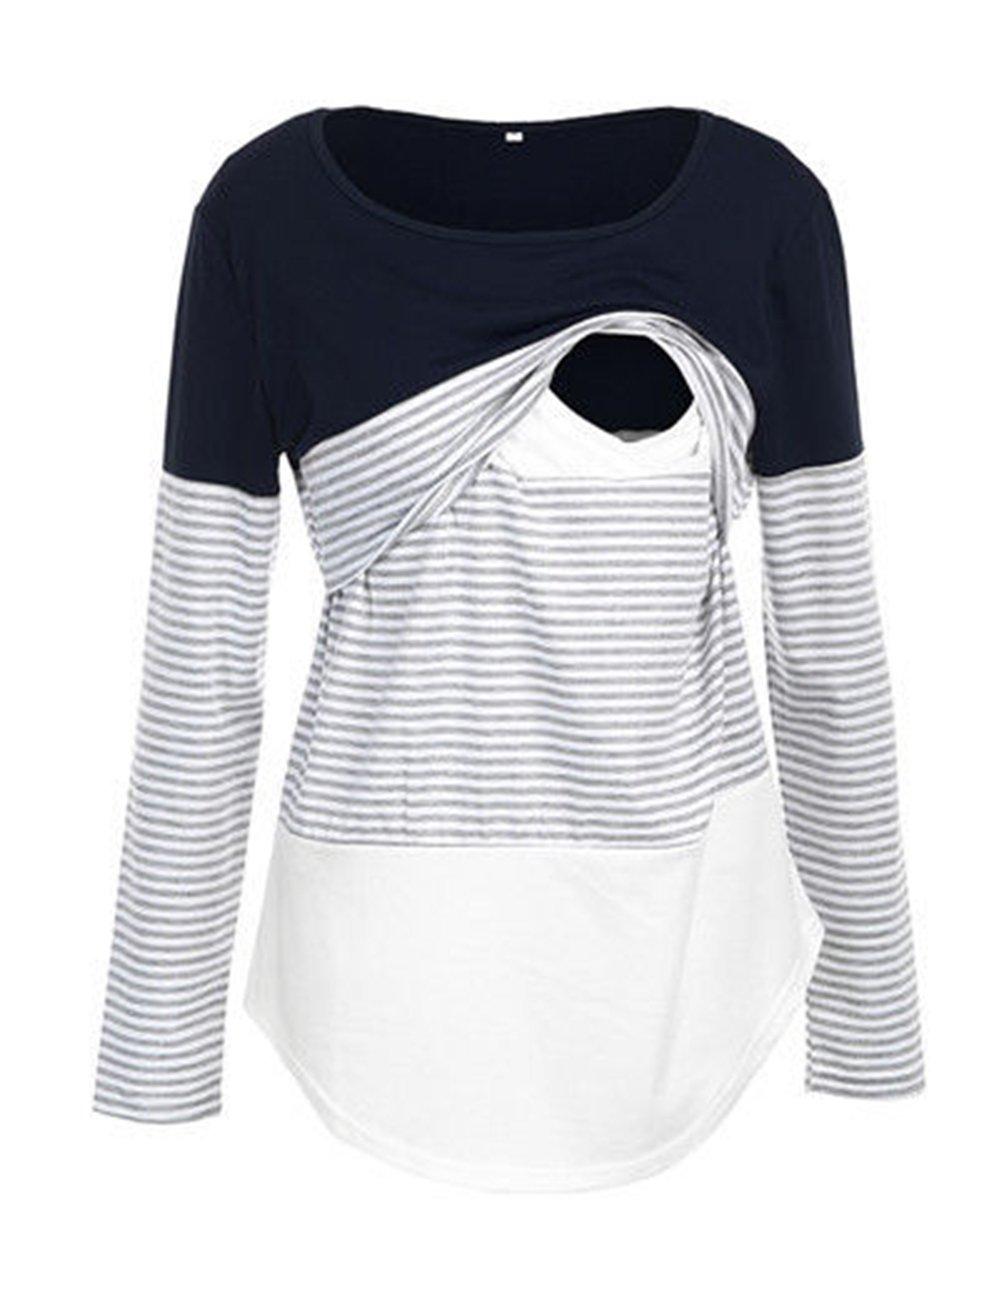 Charbolin Women Maternity Lace Striped Nursing Tops Long Sleeve Stitching Breastfeeding Shirt Tops (S, Navy Blue)